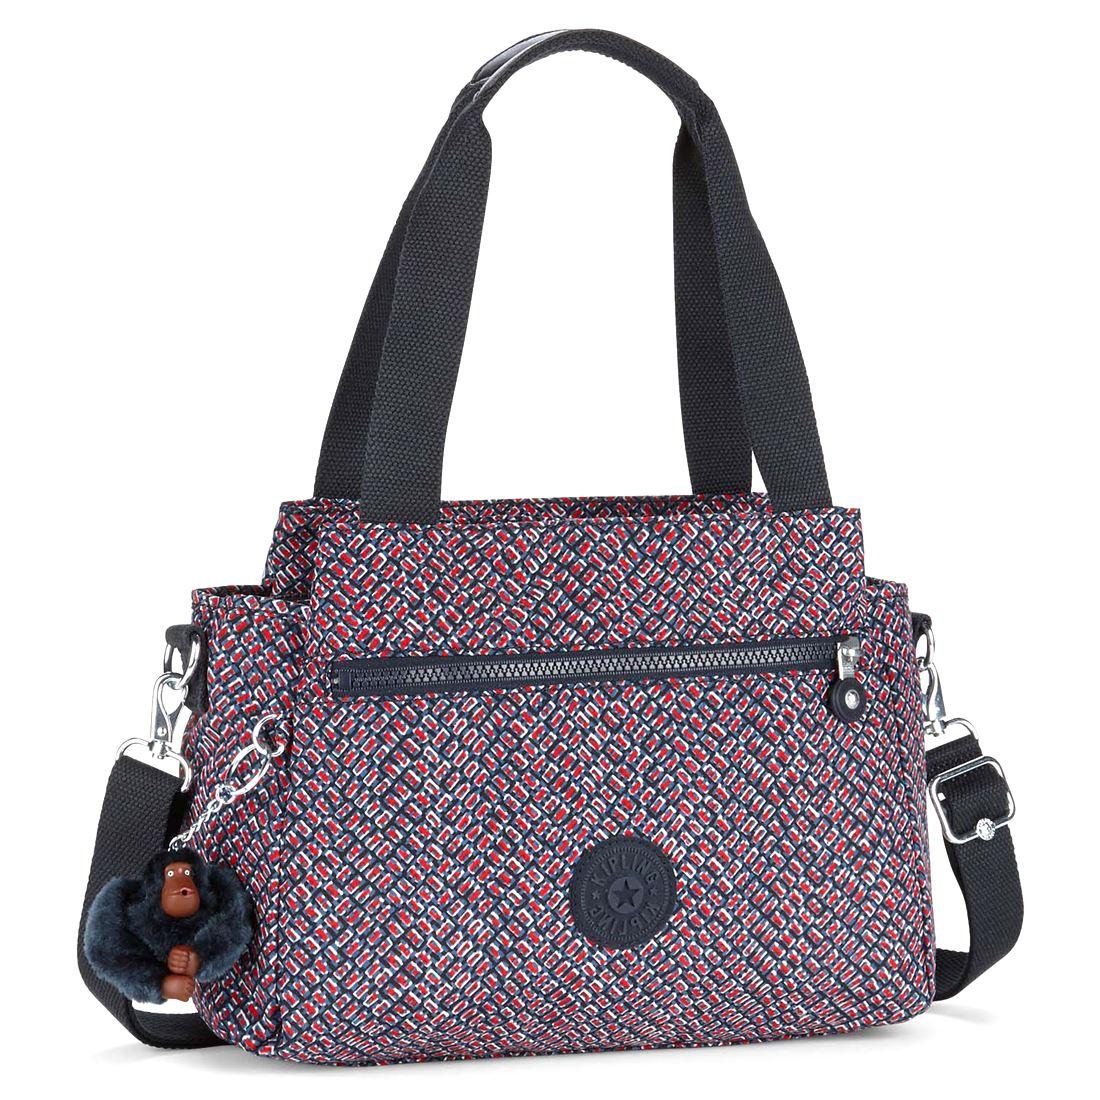 Simple Kipling DOMINICA Womenu0026#39;s Cross-body Bag Blue (REF35L Woven Haven) 30.5x29.5x18 Cm (B X H X T ...